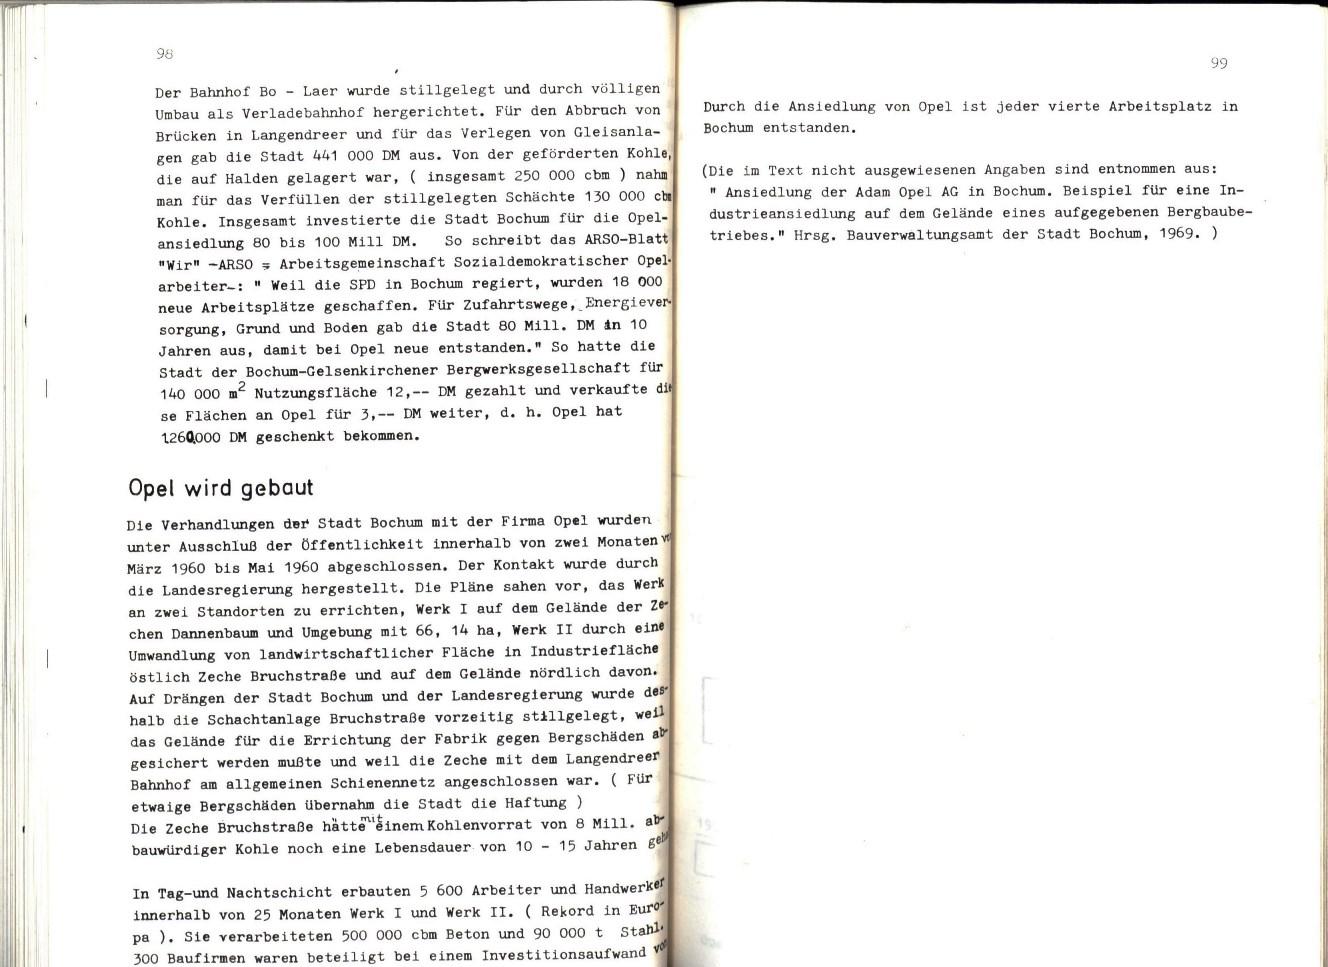 Bochum_IGM_Opel_PG_Opel_streikt_1973_051